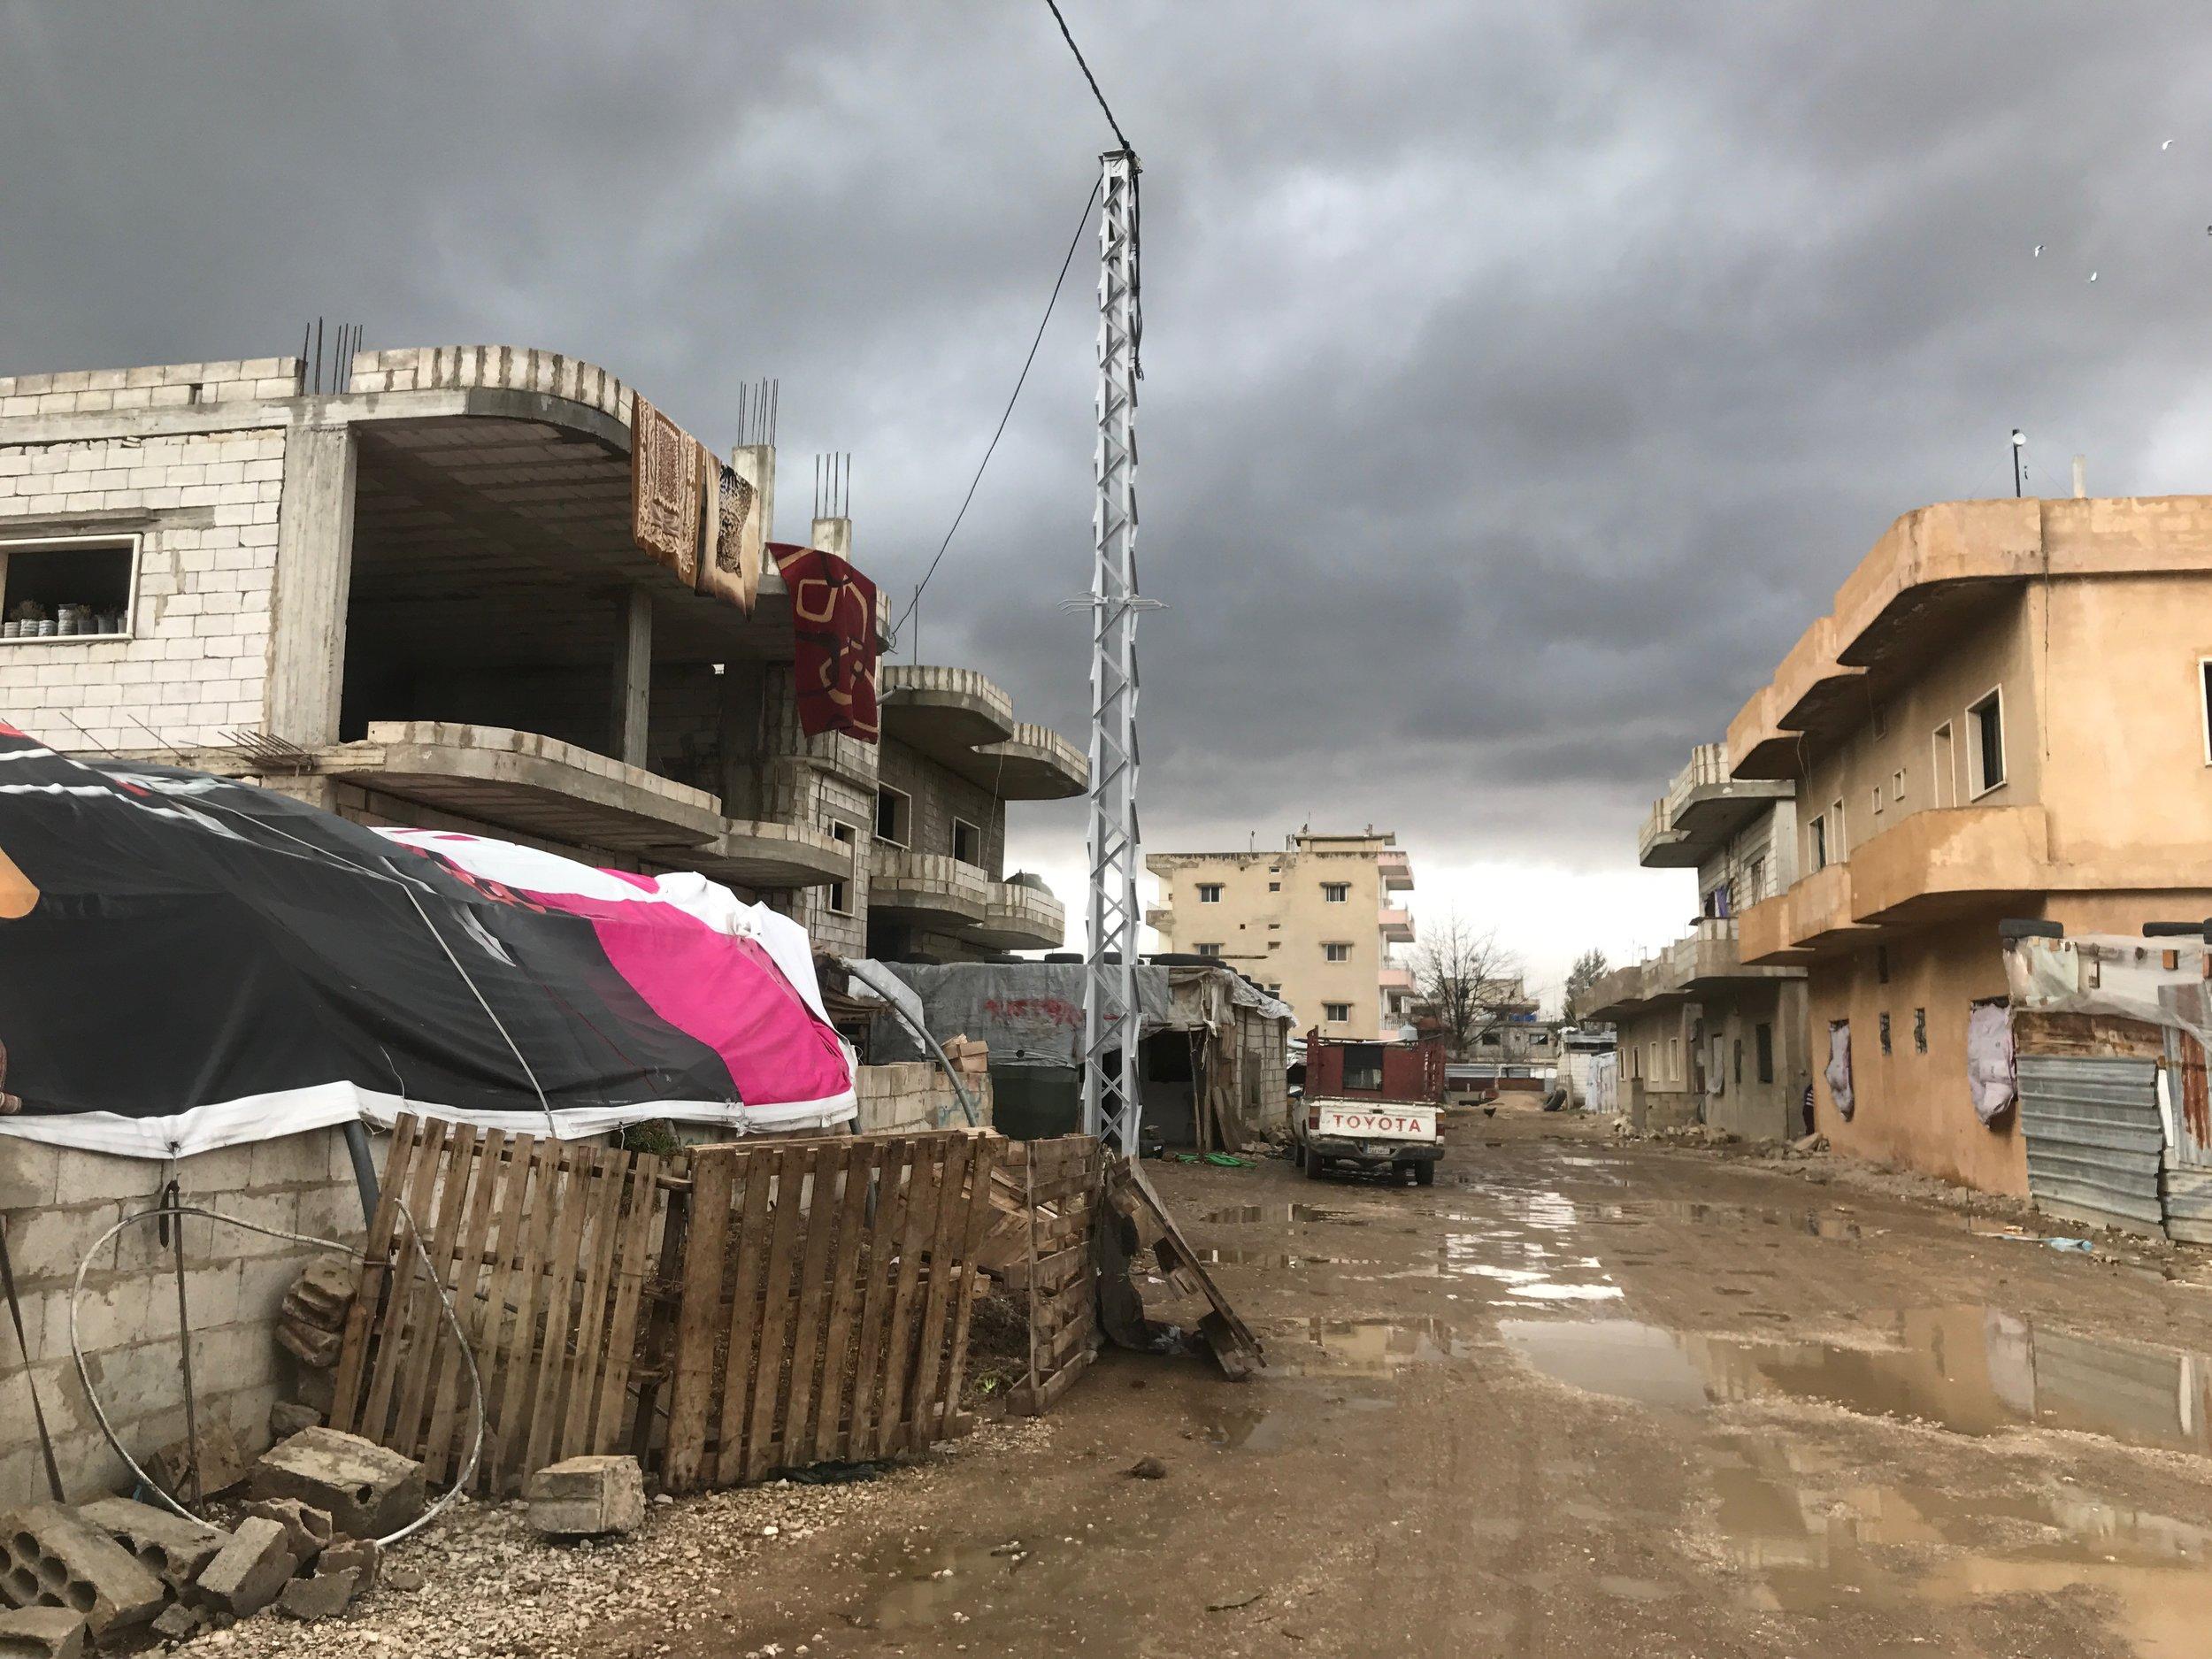 Refugee camp in Lebanon. Photo by Evey McKellar